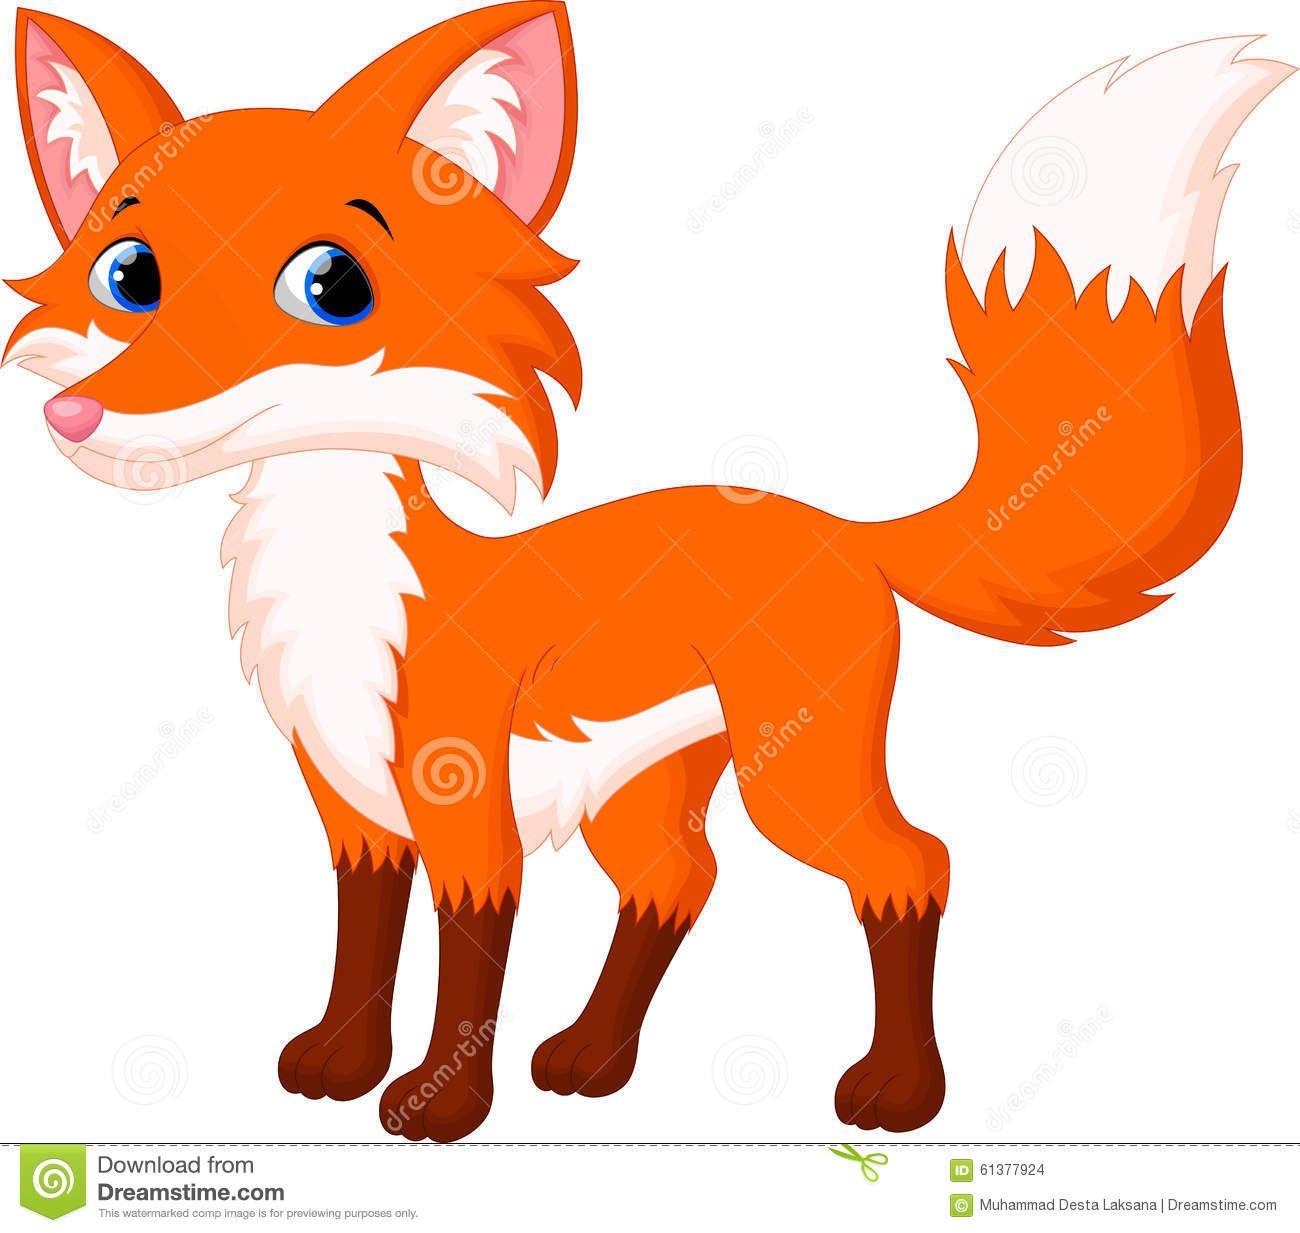 Cute Fox Cartoon Stock Illustration Image 61377924 Cartoon Fox Drawing Cartoon Drawing For Kids Cute Fox